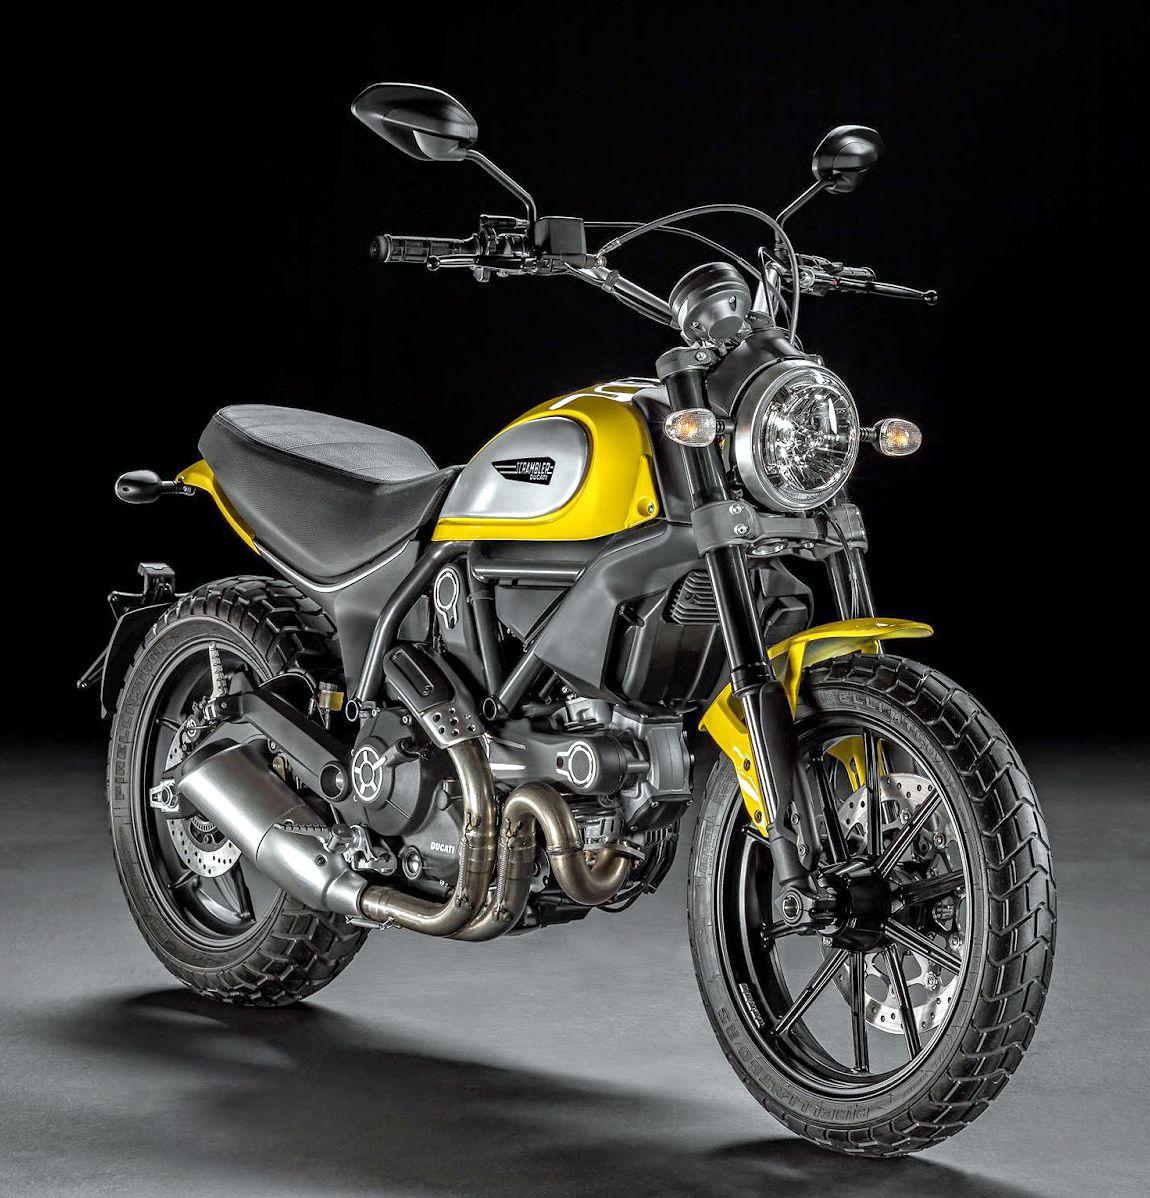 Ducati Scrambler Icon 62 Yellow Bikes Scrambler Motorcycle